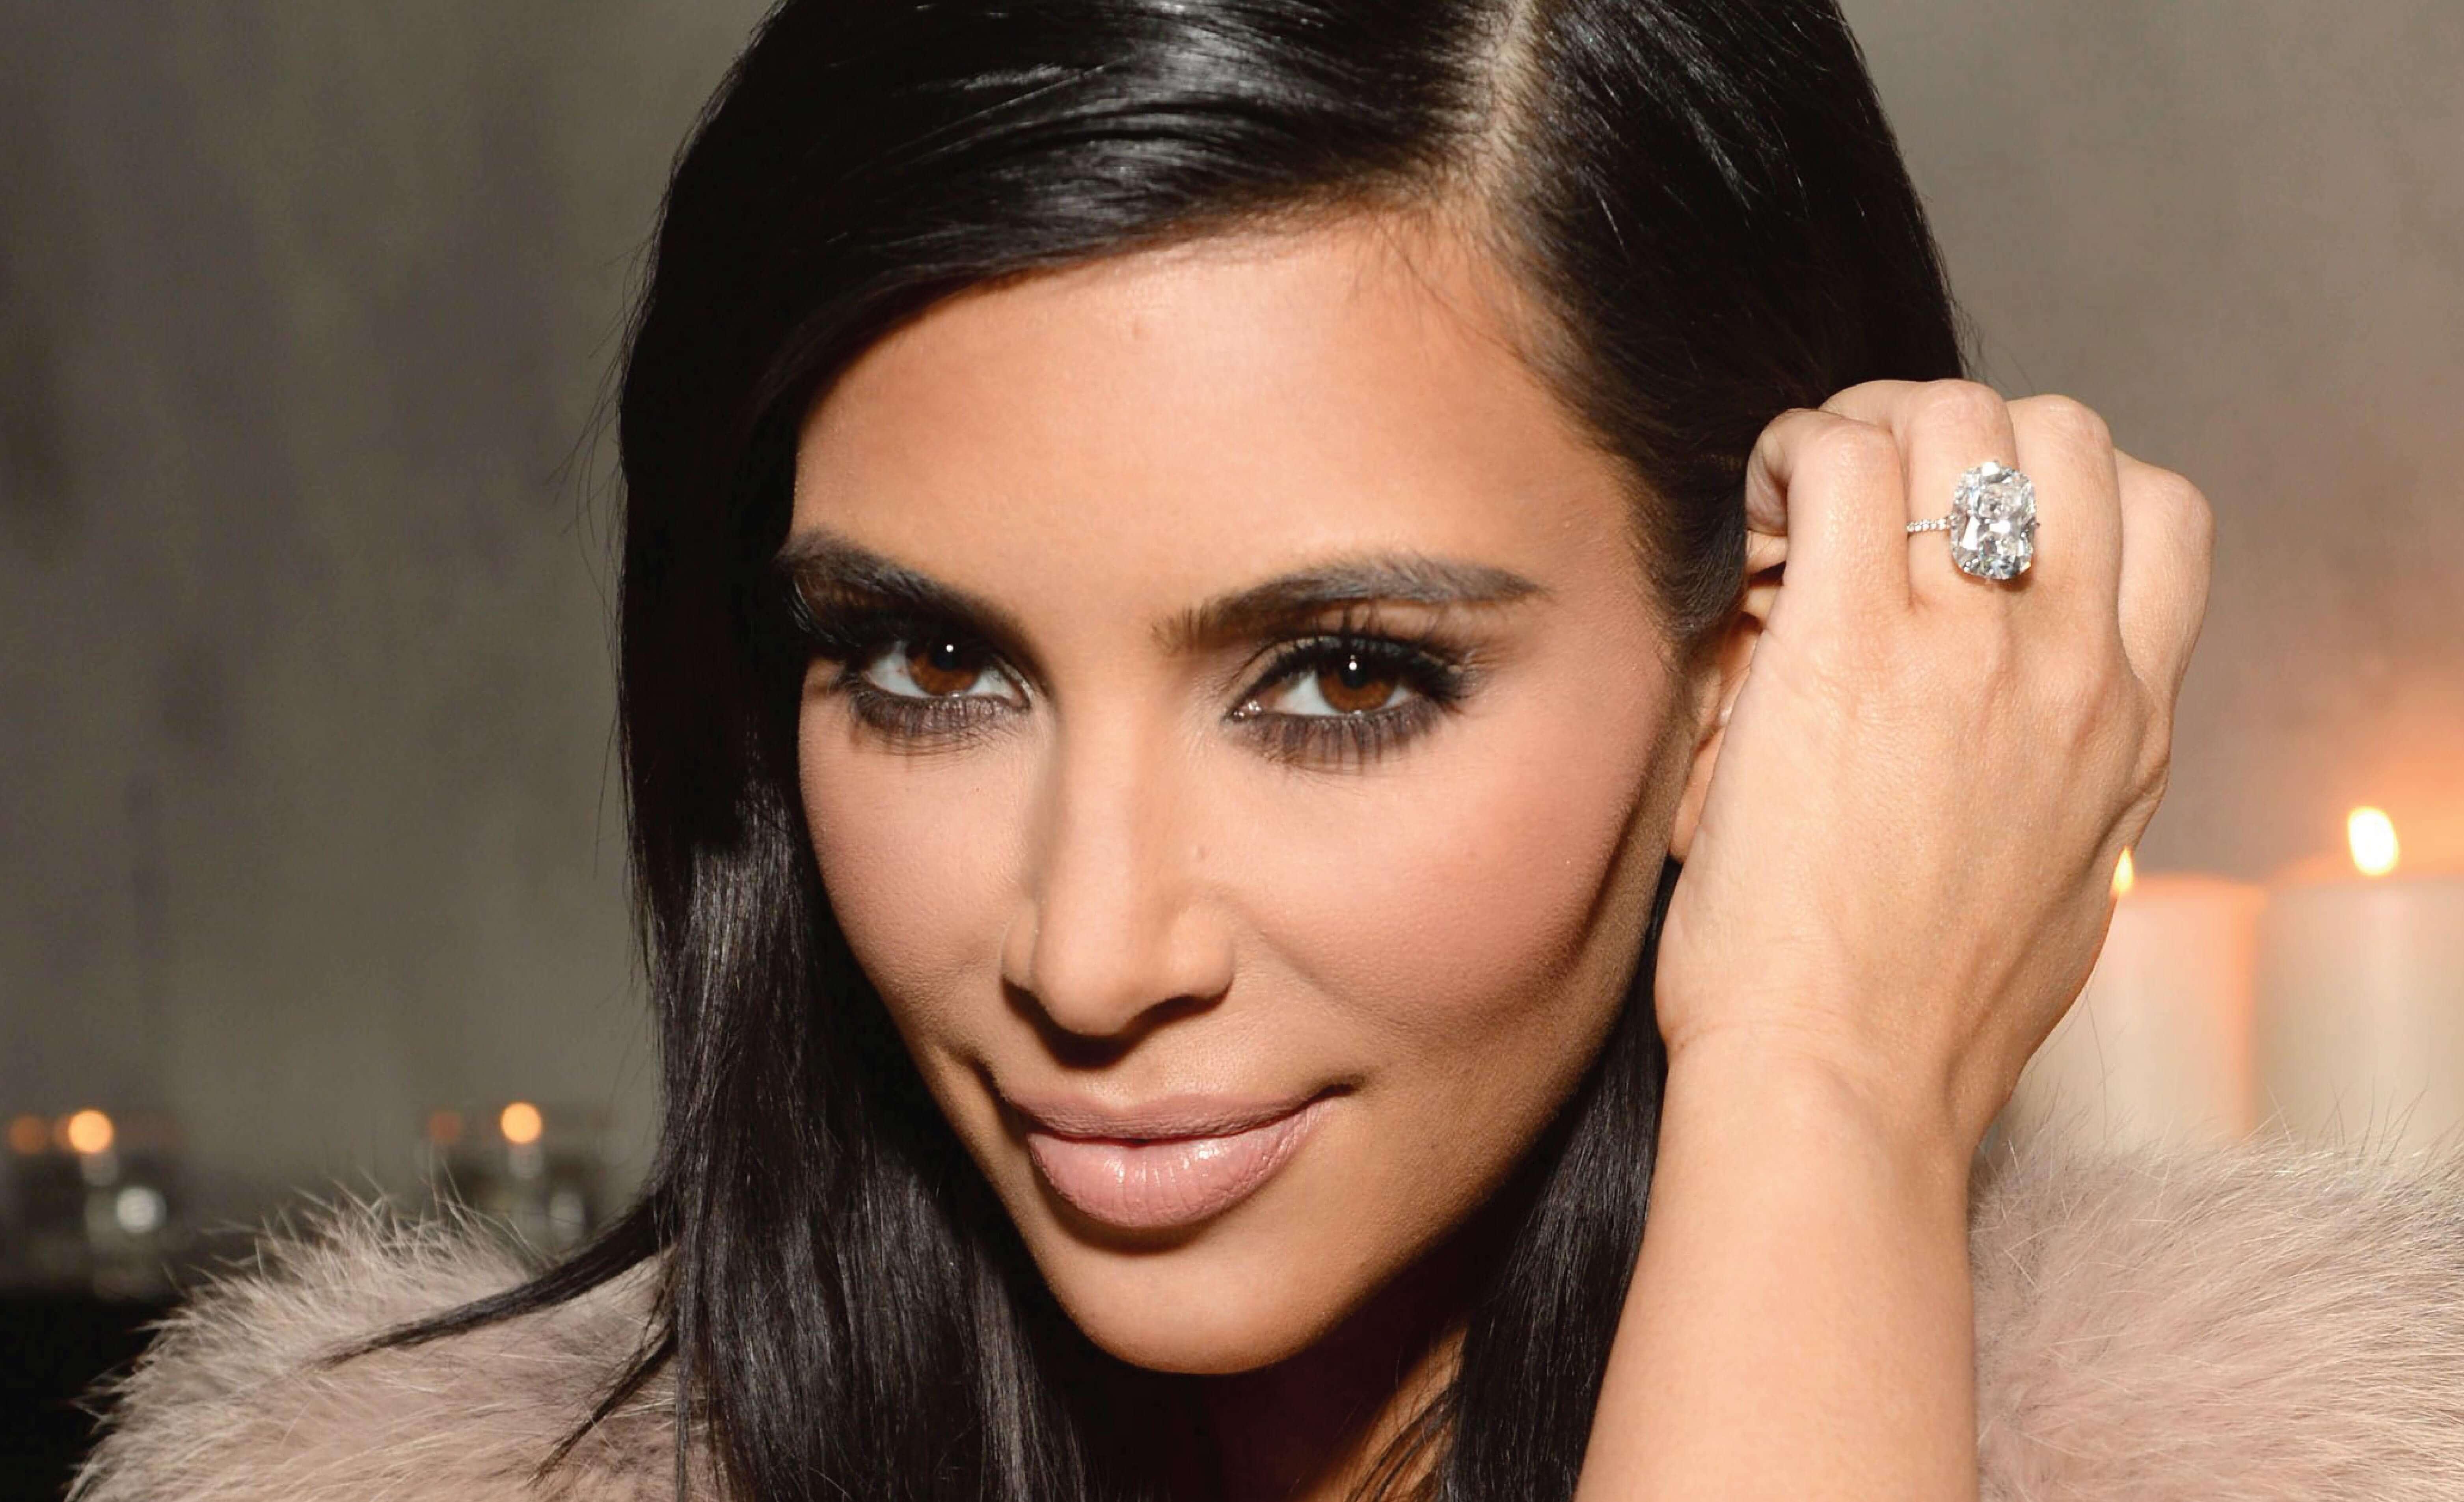 Has Kim Kardashian had Cosmetic Surgery?